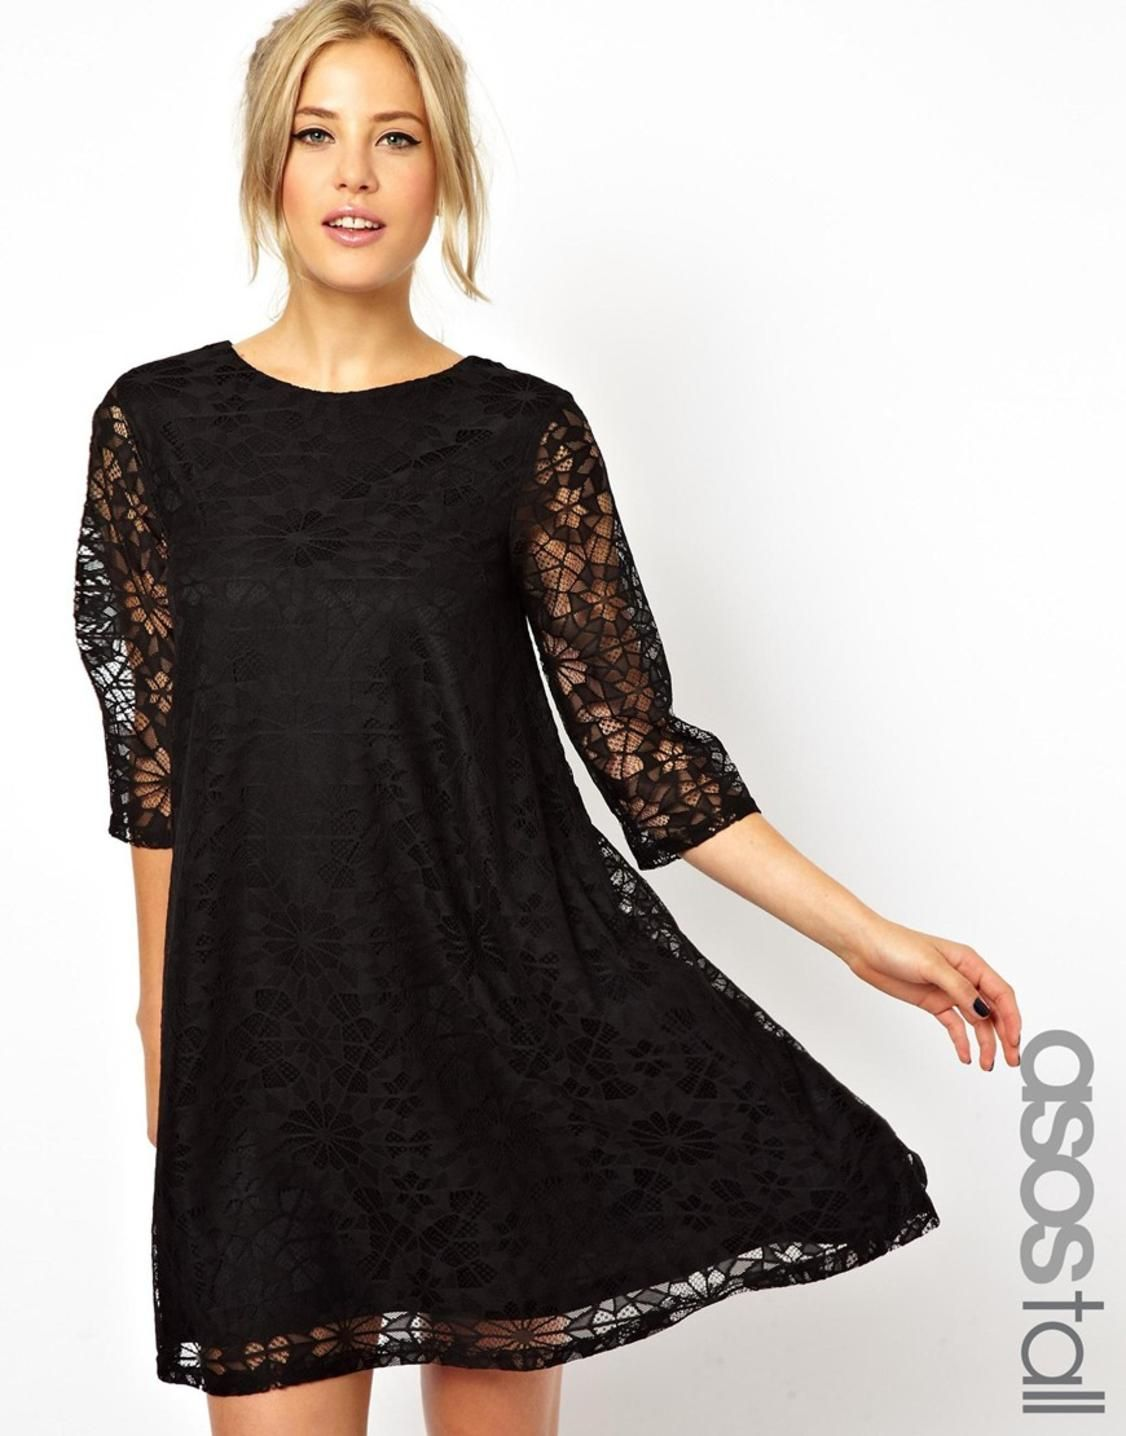 Black dress asos - Madeleine Thompson Asos Swing Dress In Nepi With Long Sleeves In